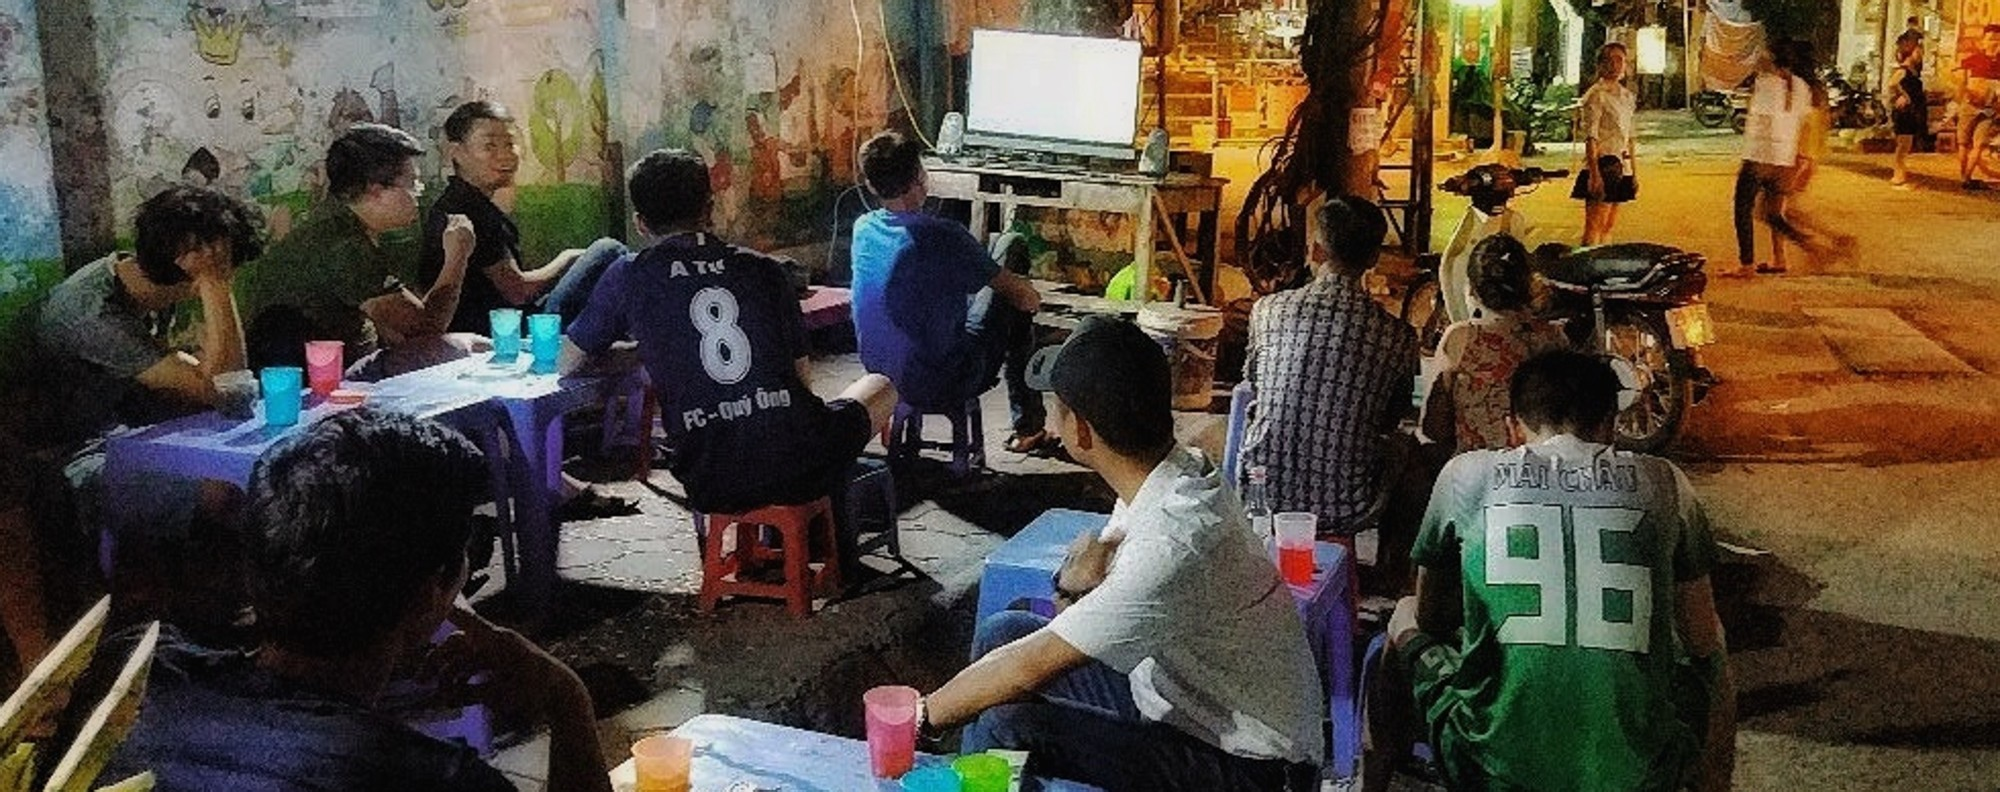 Watching the World Cup in Hanoi. Photo: Ceritalah Asean